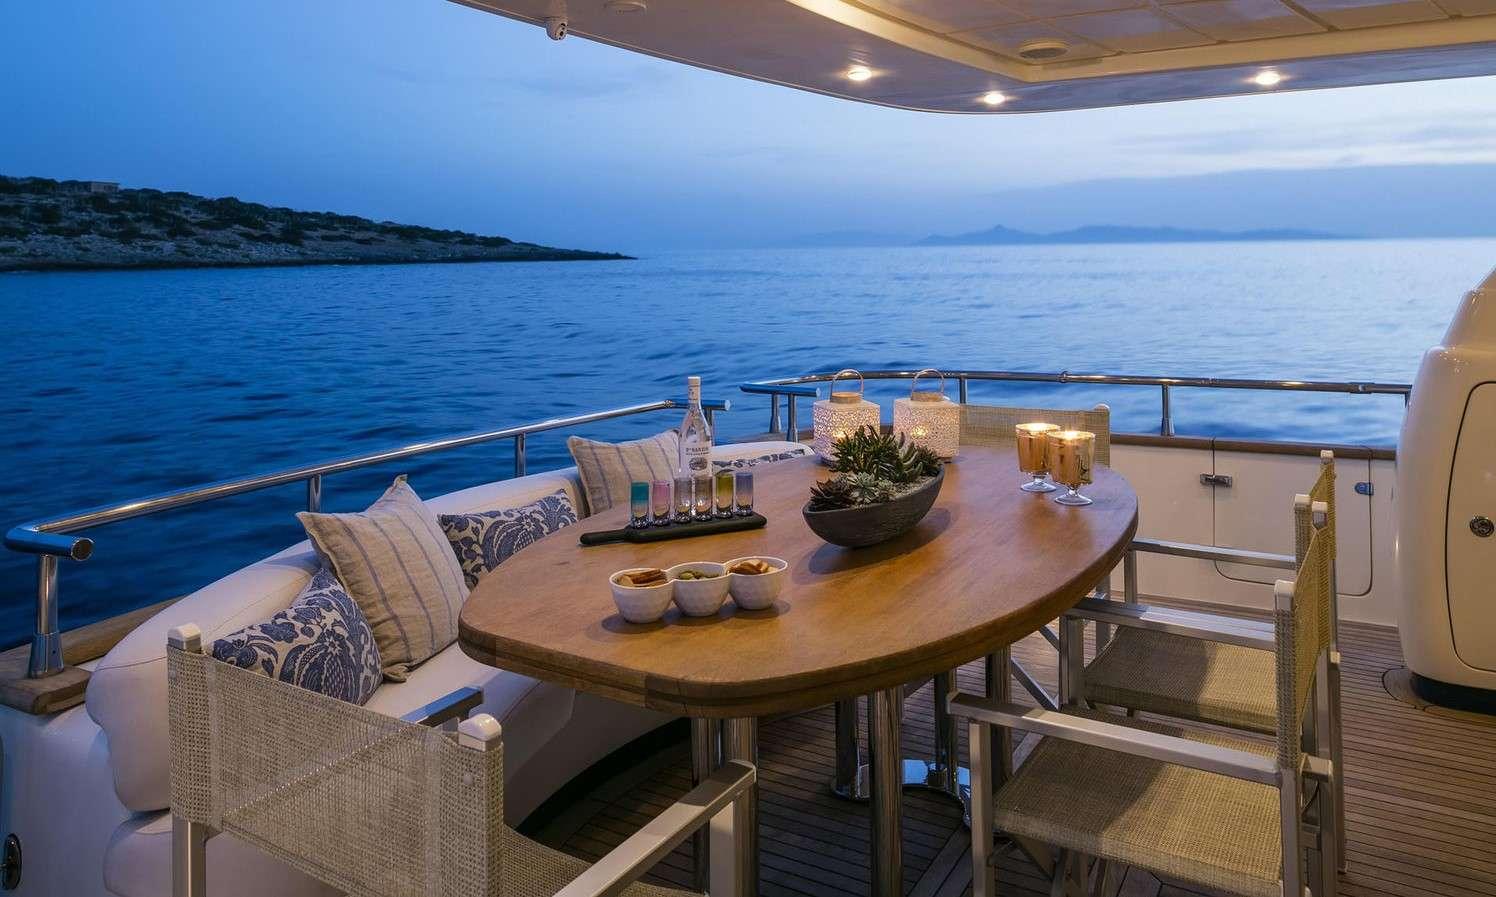 Aft deck night view